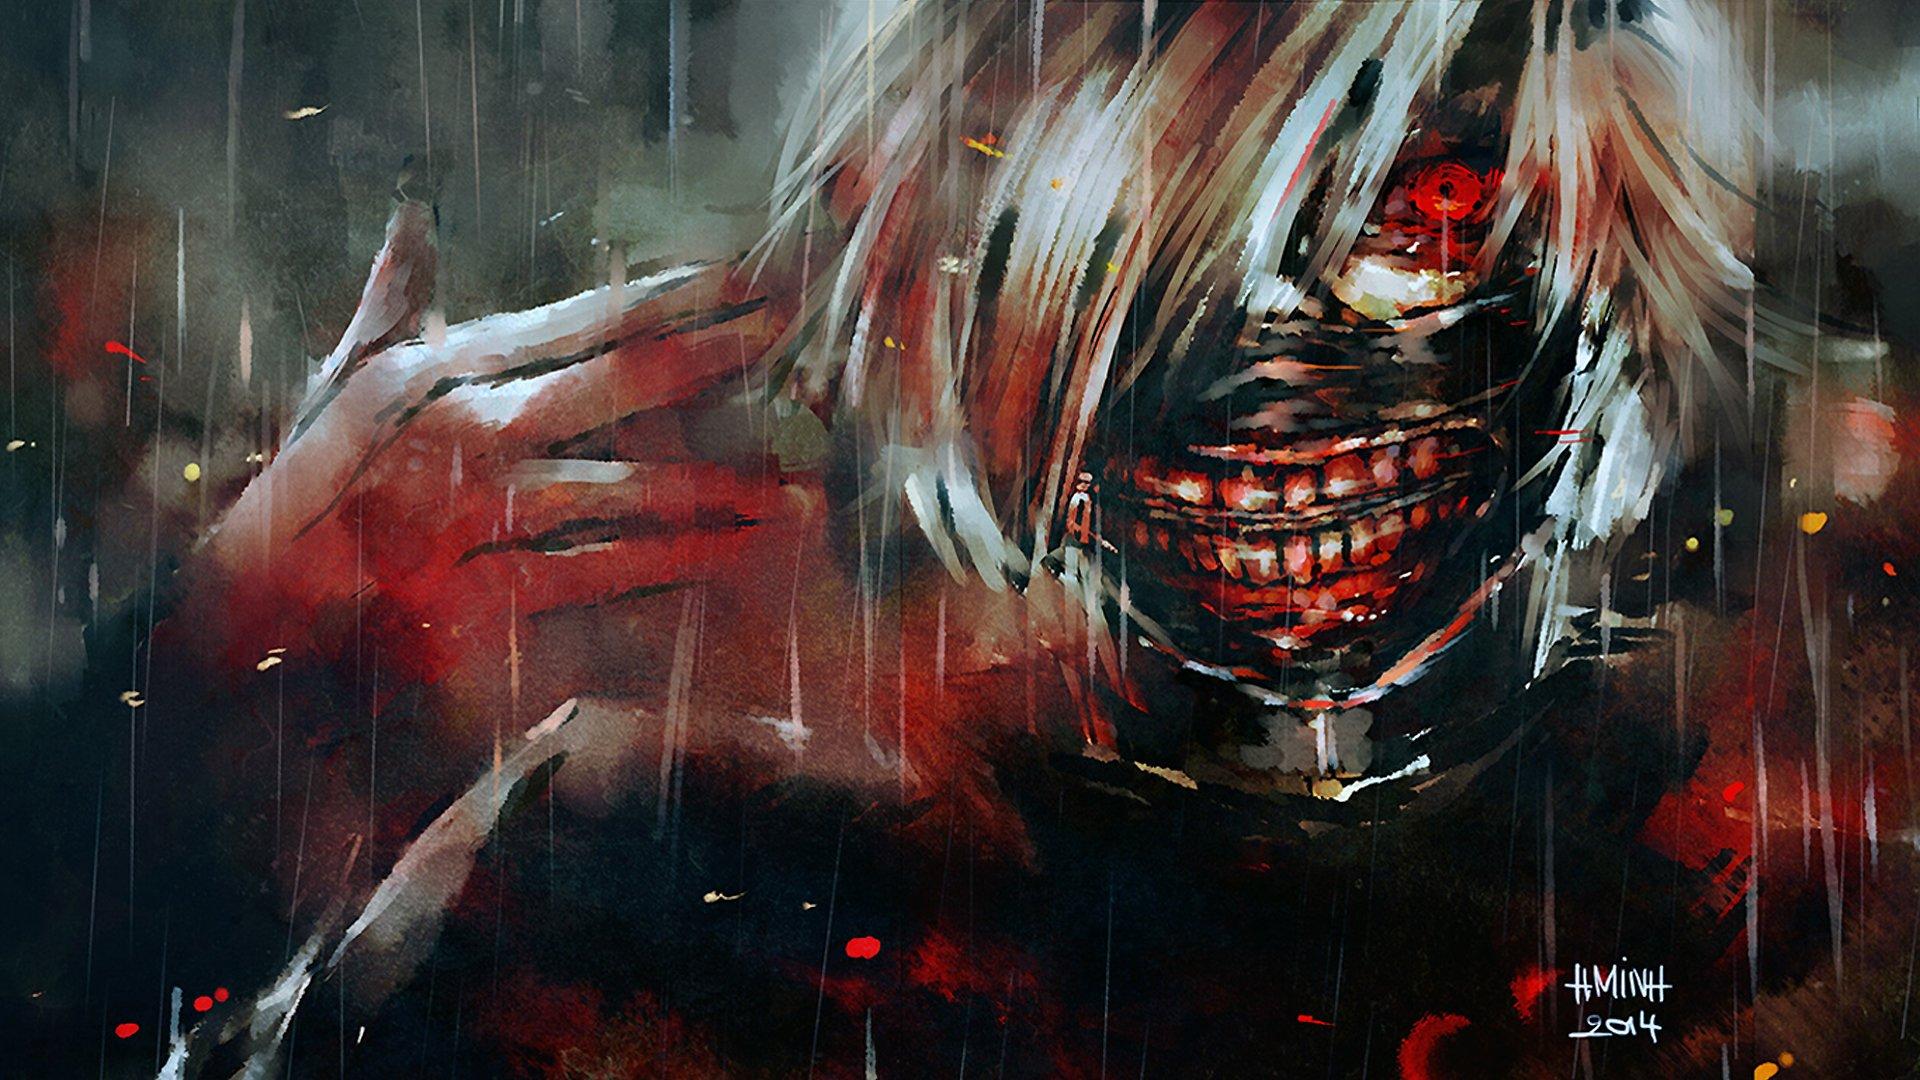 Hd wallpaper tokyo ghoul - Hd Wallpaper Background Id 596878